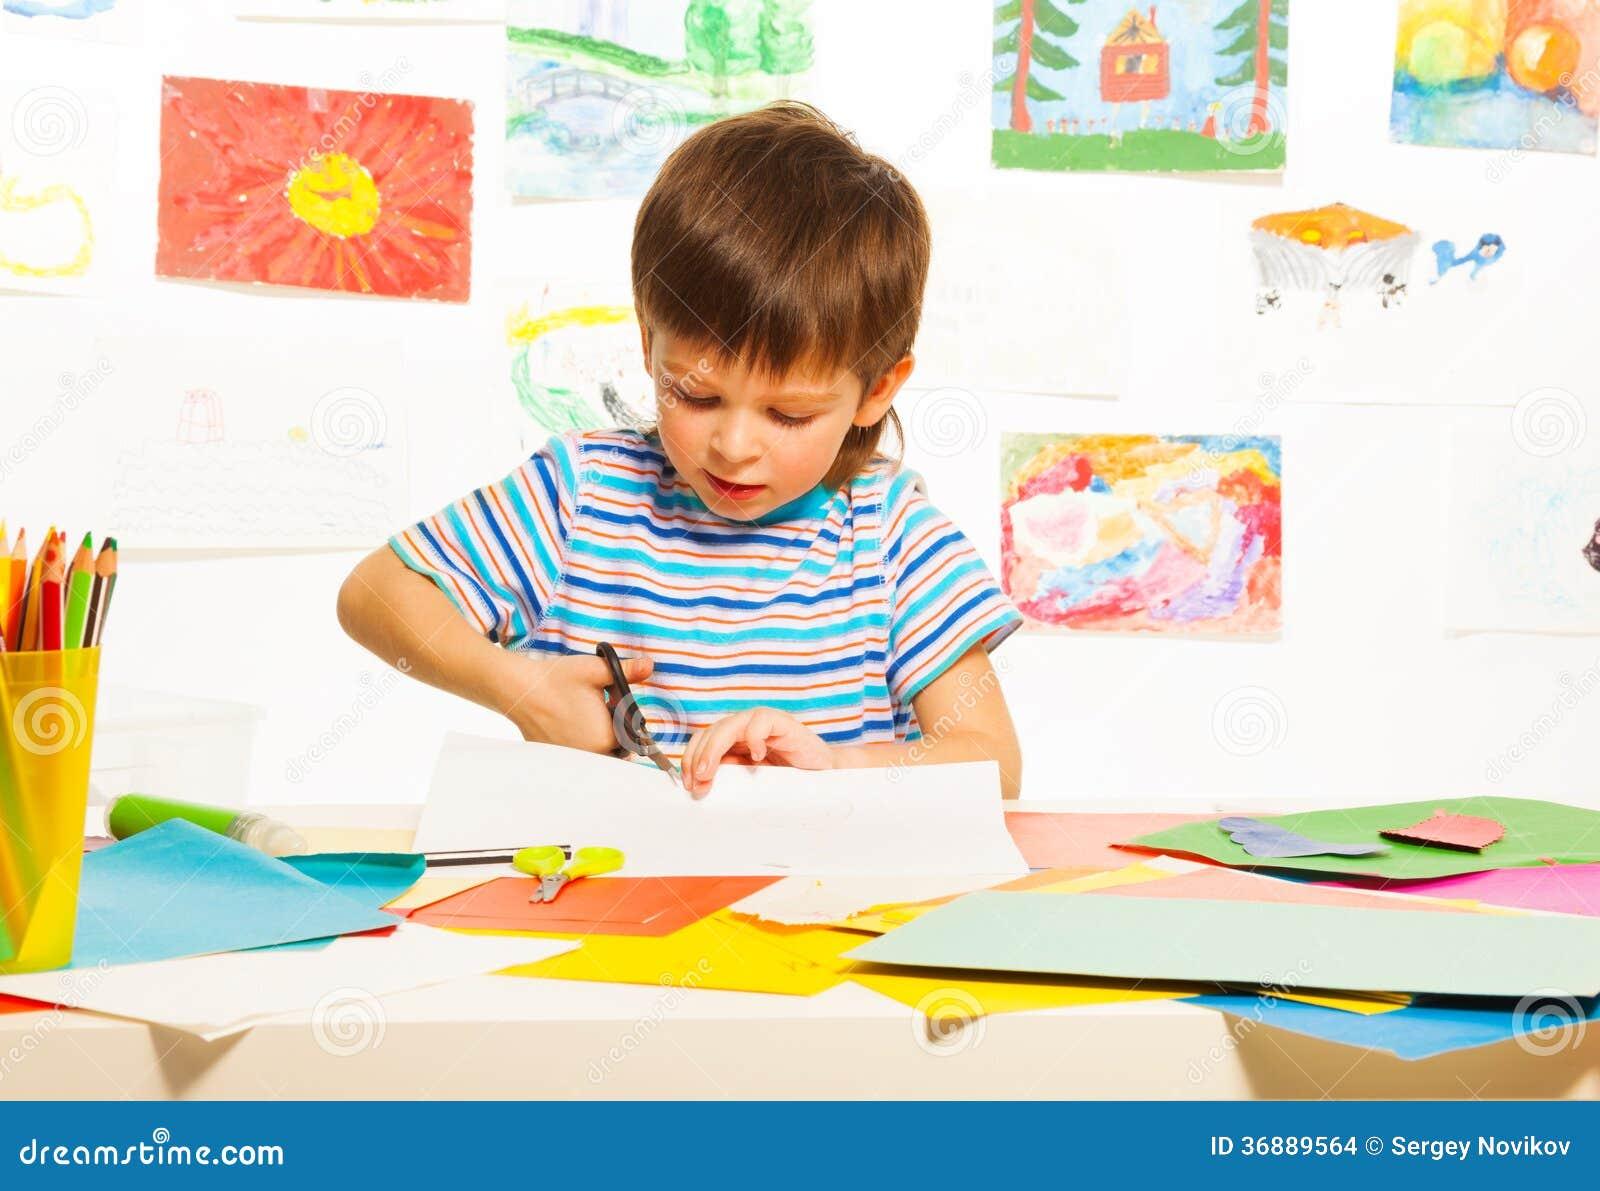 Education/ Cutting Class term paper 12132